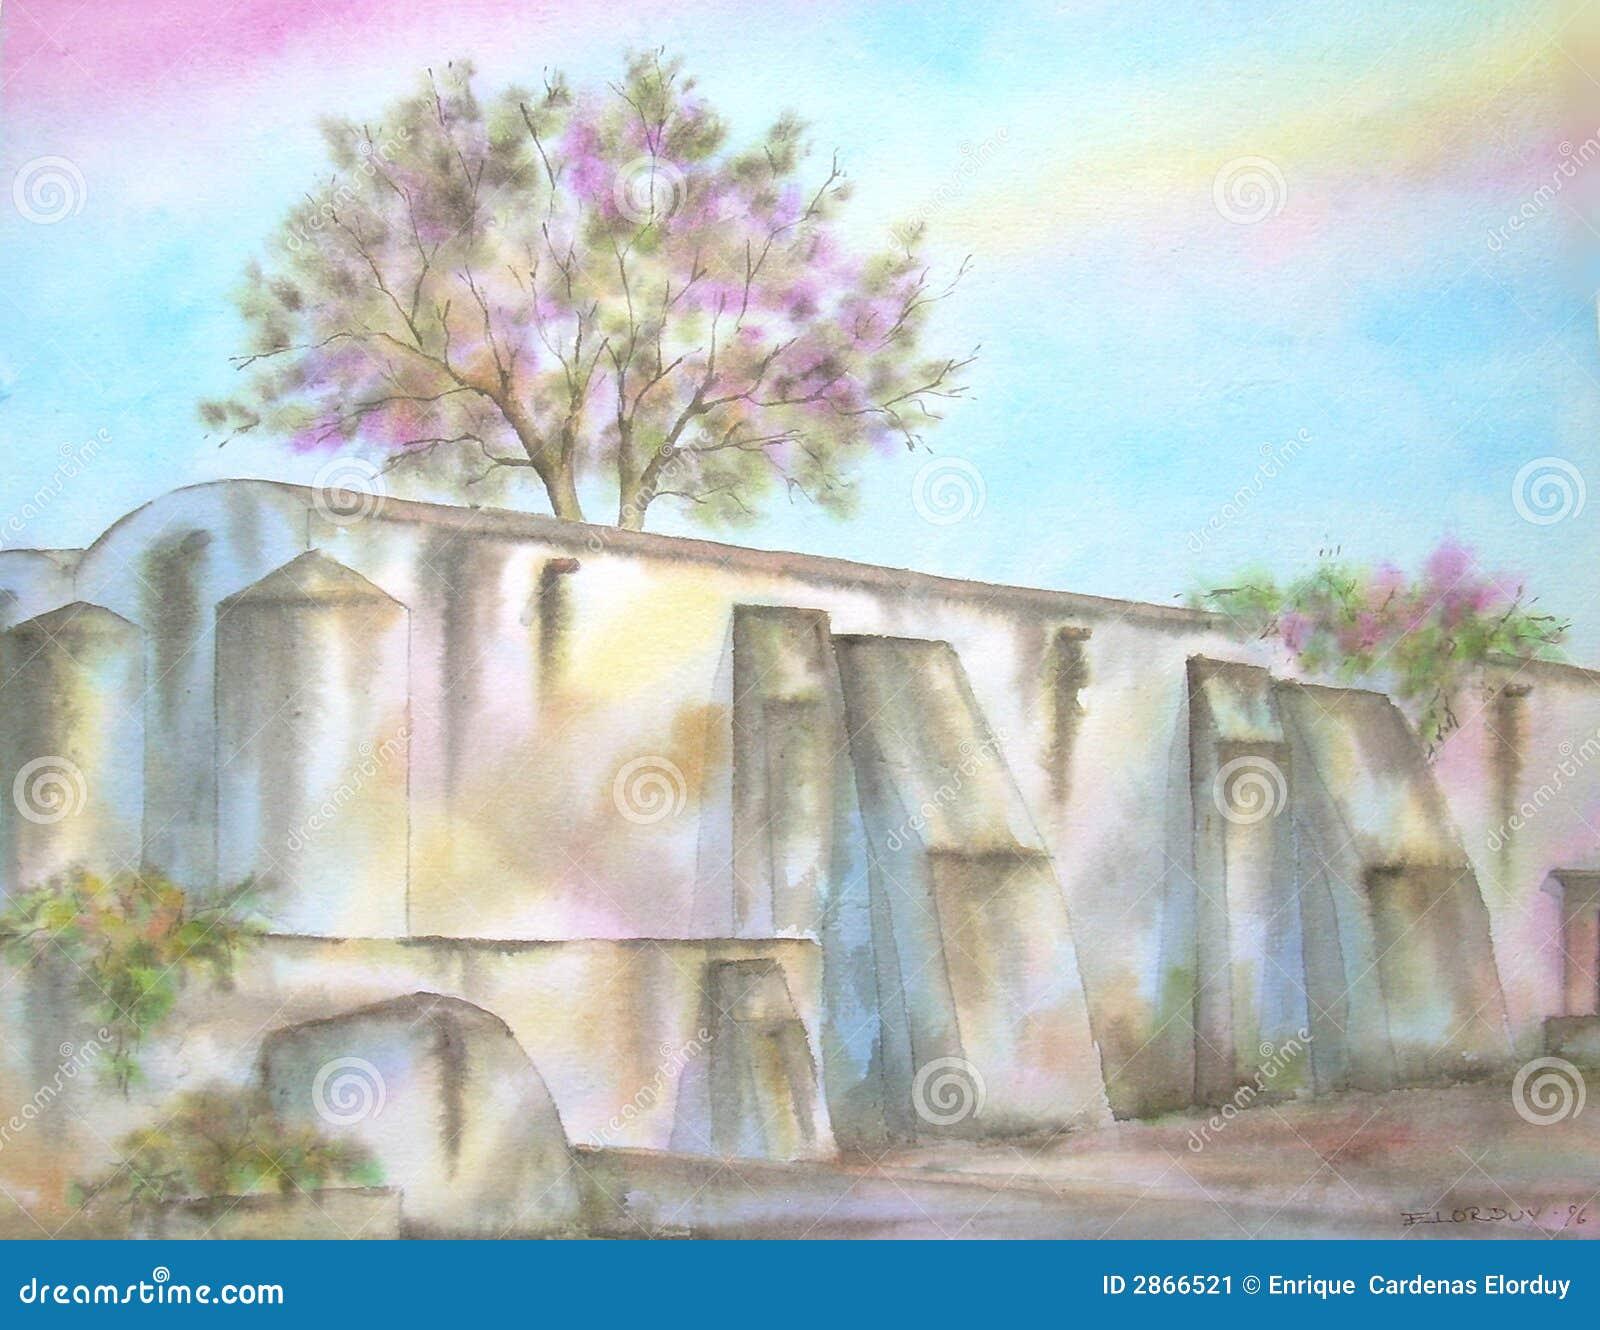 Stare meksykańskie hacjend ruin